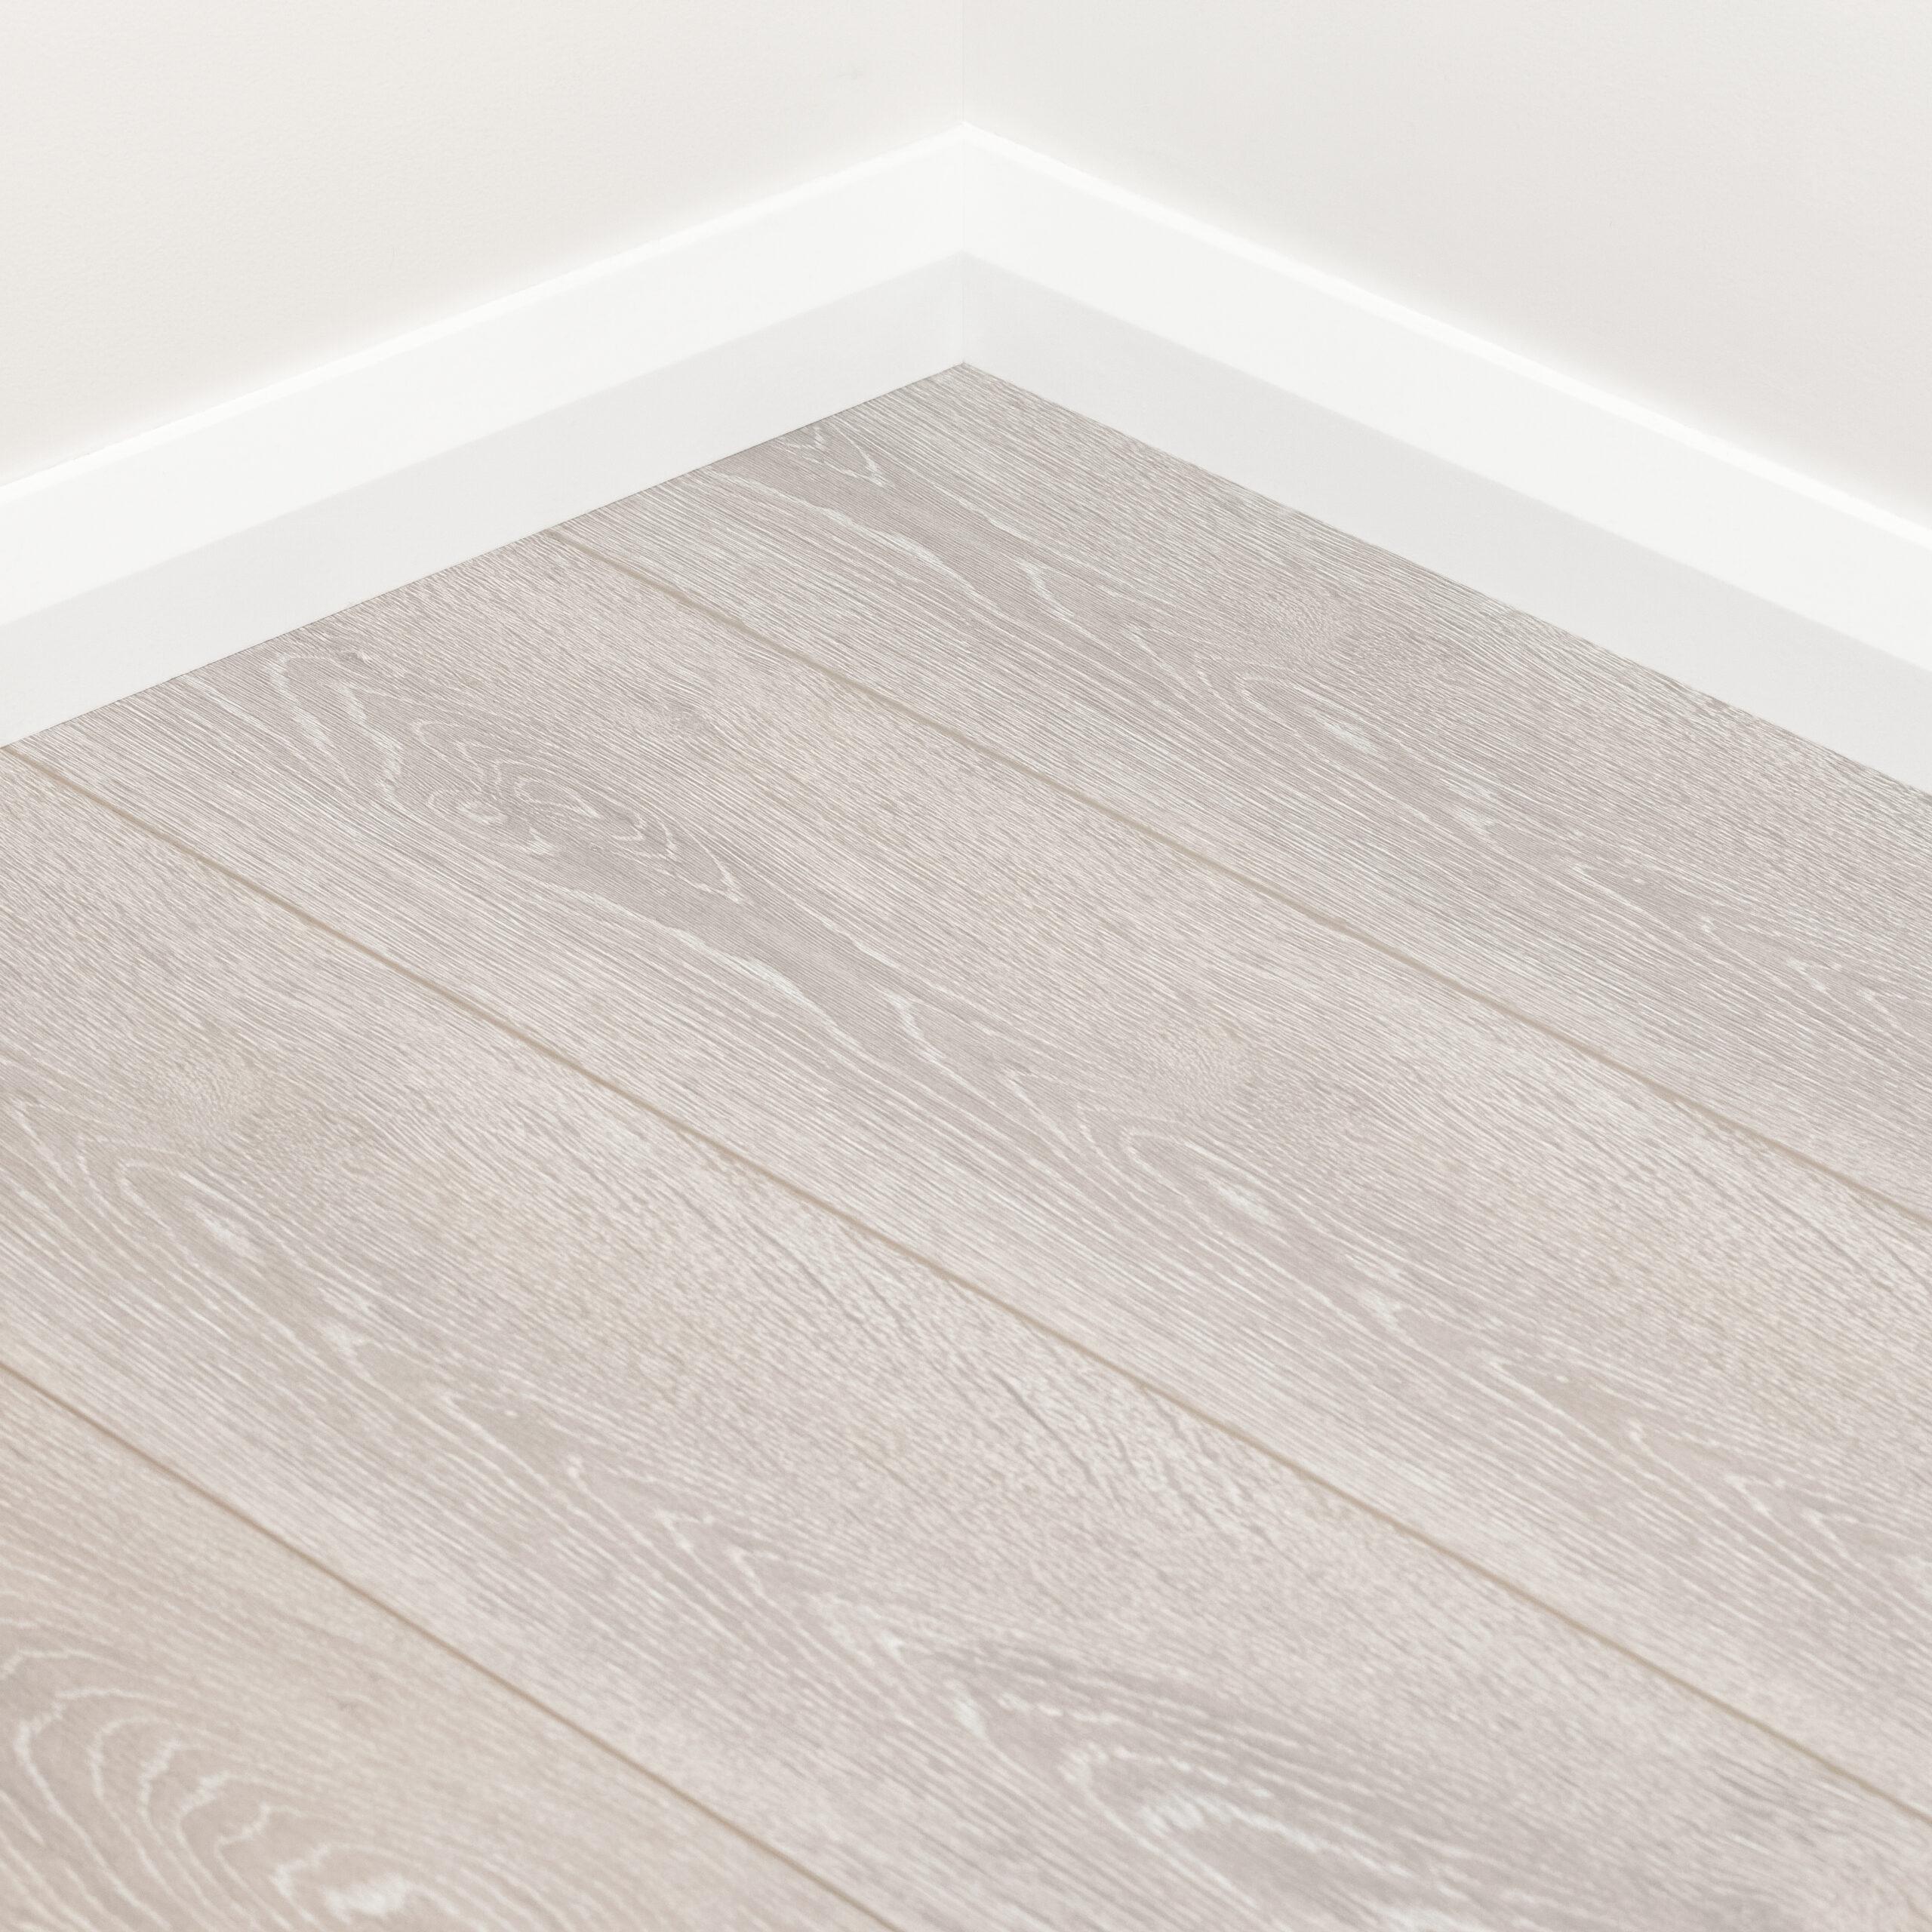 Tanoa Flooring 12mm Longboard Laminate, Weathered Oak Laminate Flooring